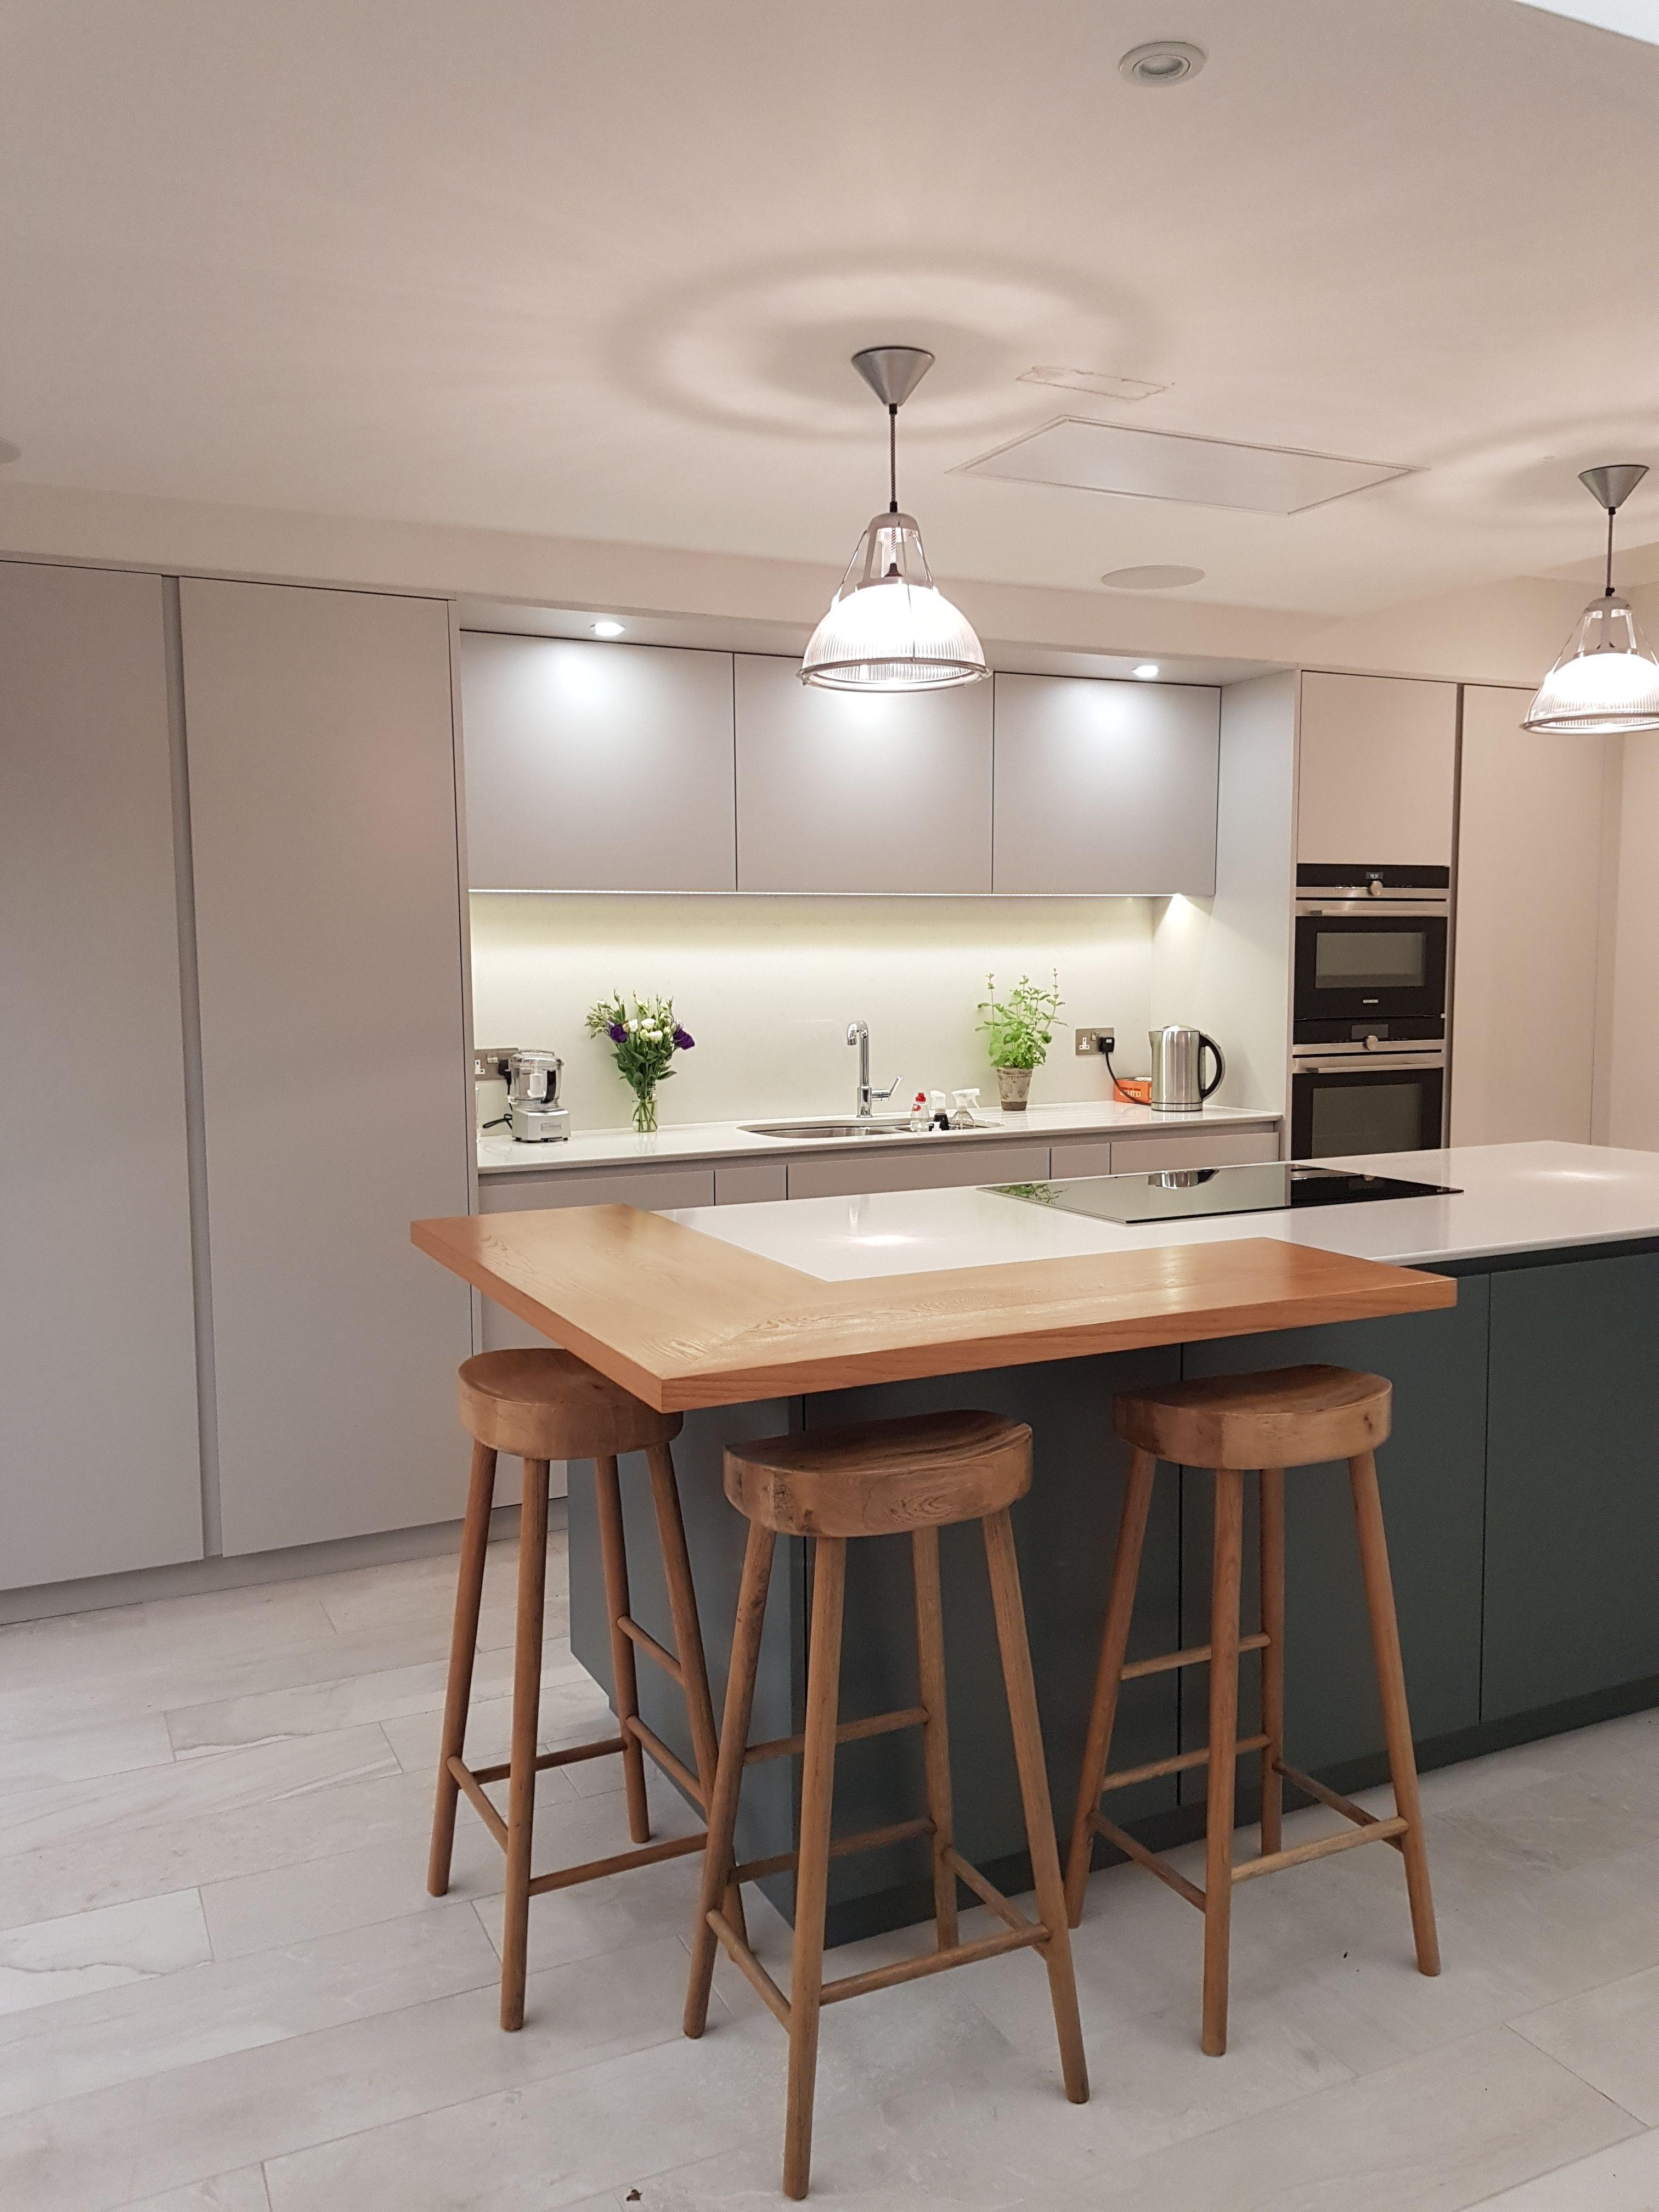 Bespoke contemporary kitchen designed by Arlberry Bespoke ...